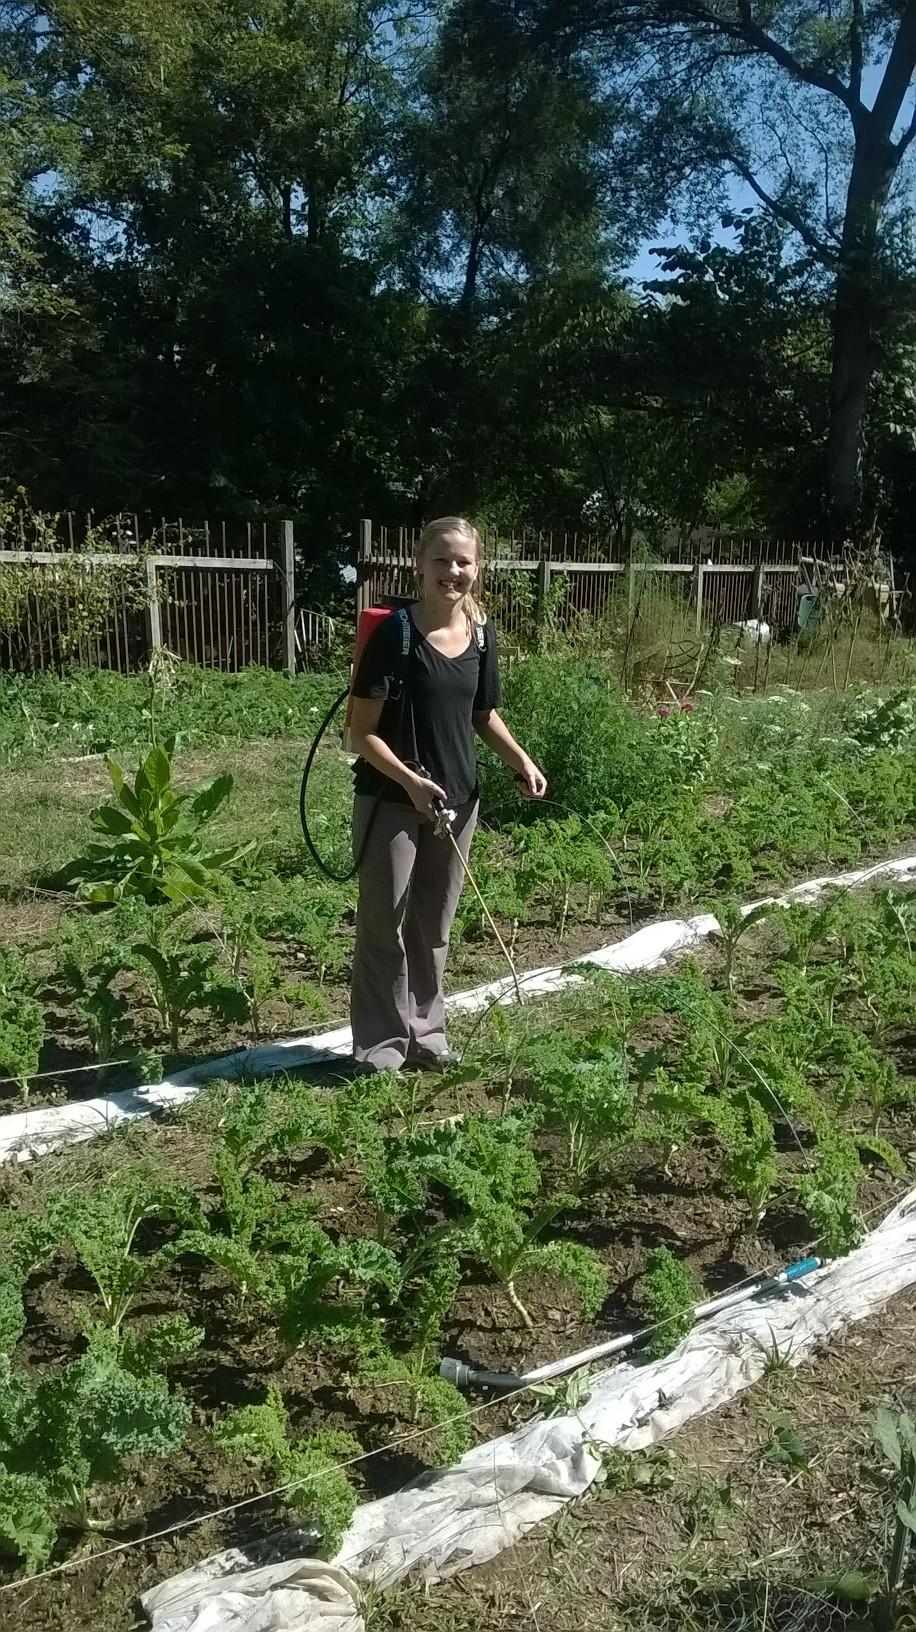 Kate working in the Wedgewood Urban Garden.